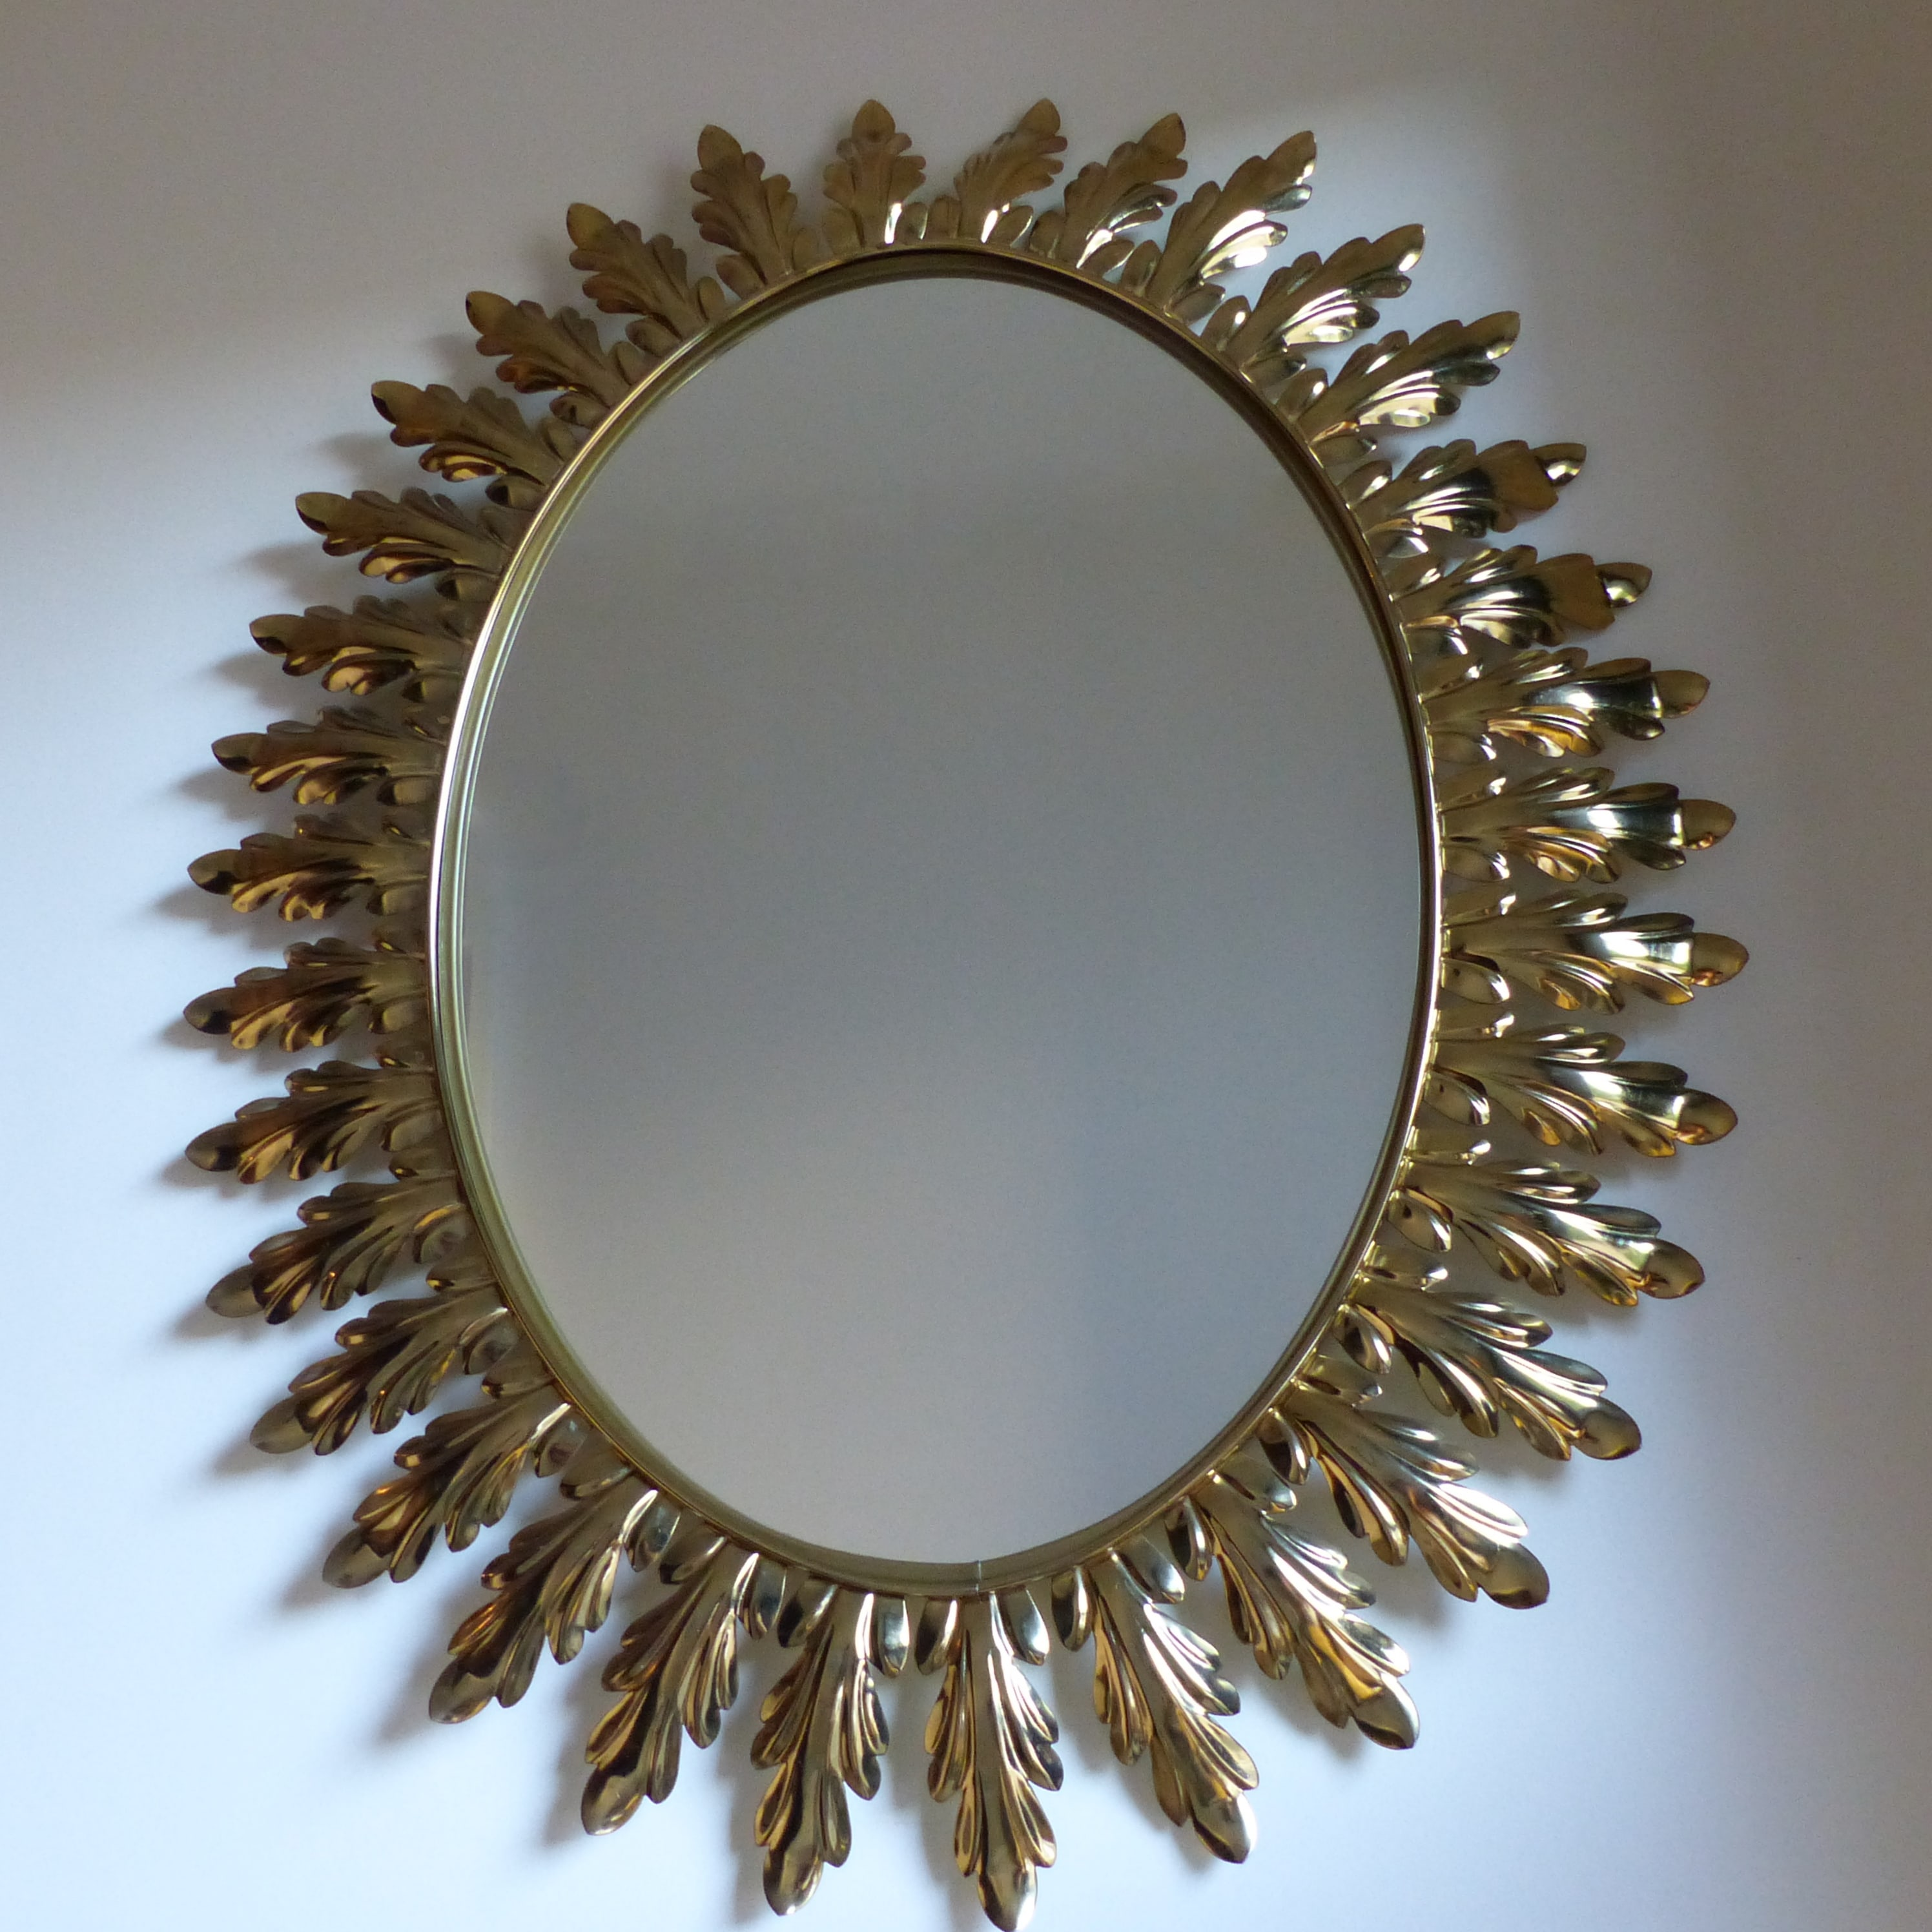 miroir vintage d cor de feuilles lignedebrocante. Black Bedroom Furniture Sets. Home Design Ideas